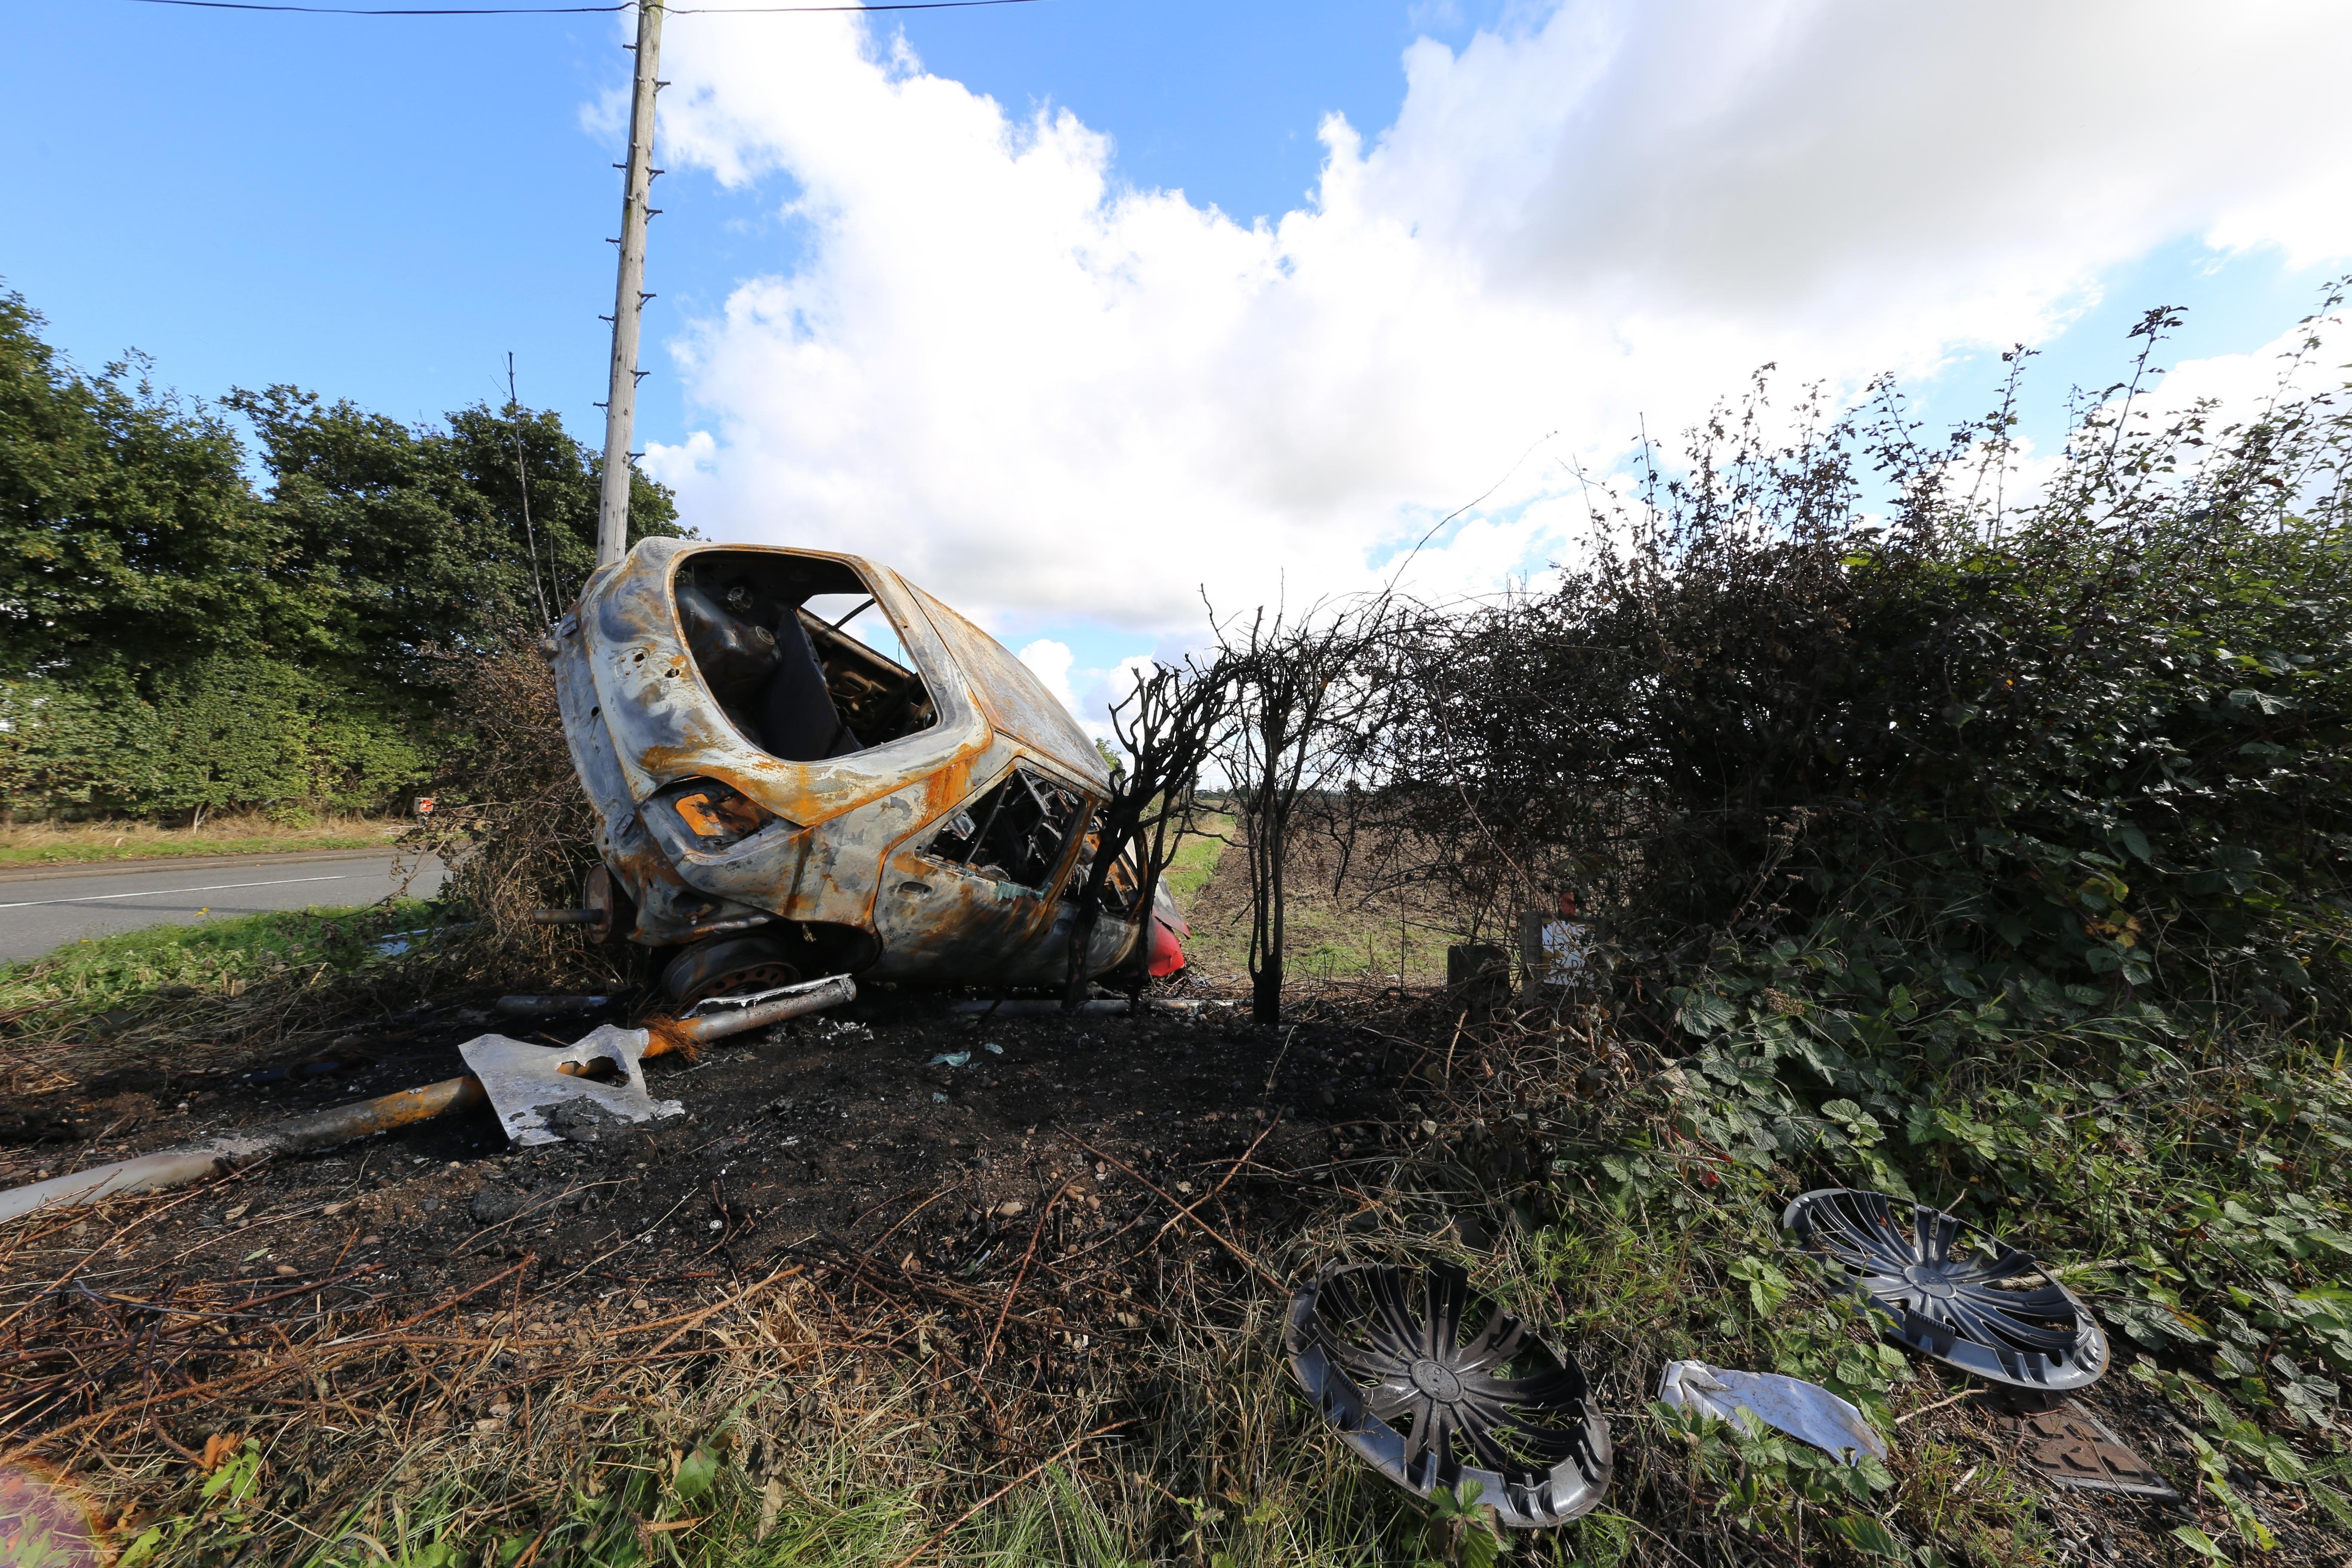 Free Images : vehicle, soil, car crash, car wreck, car accident ...